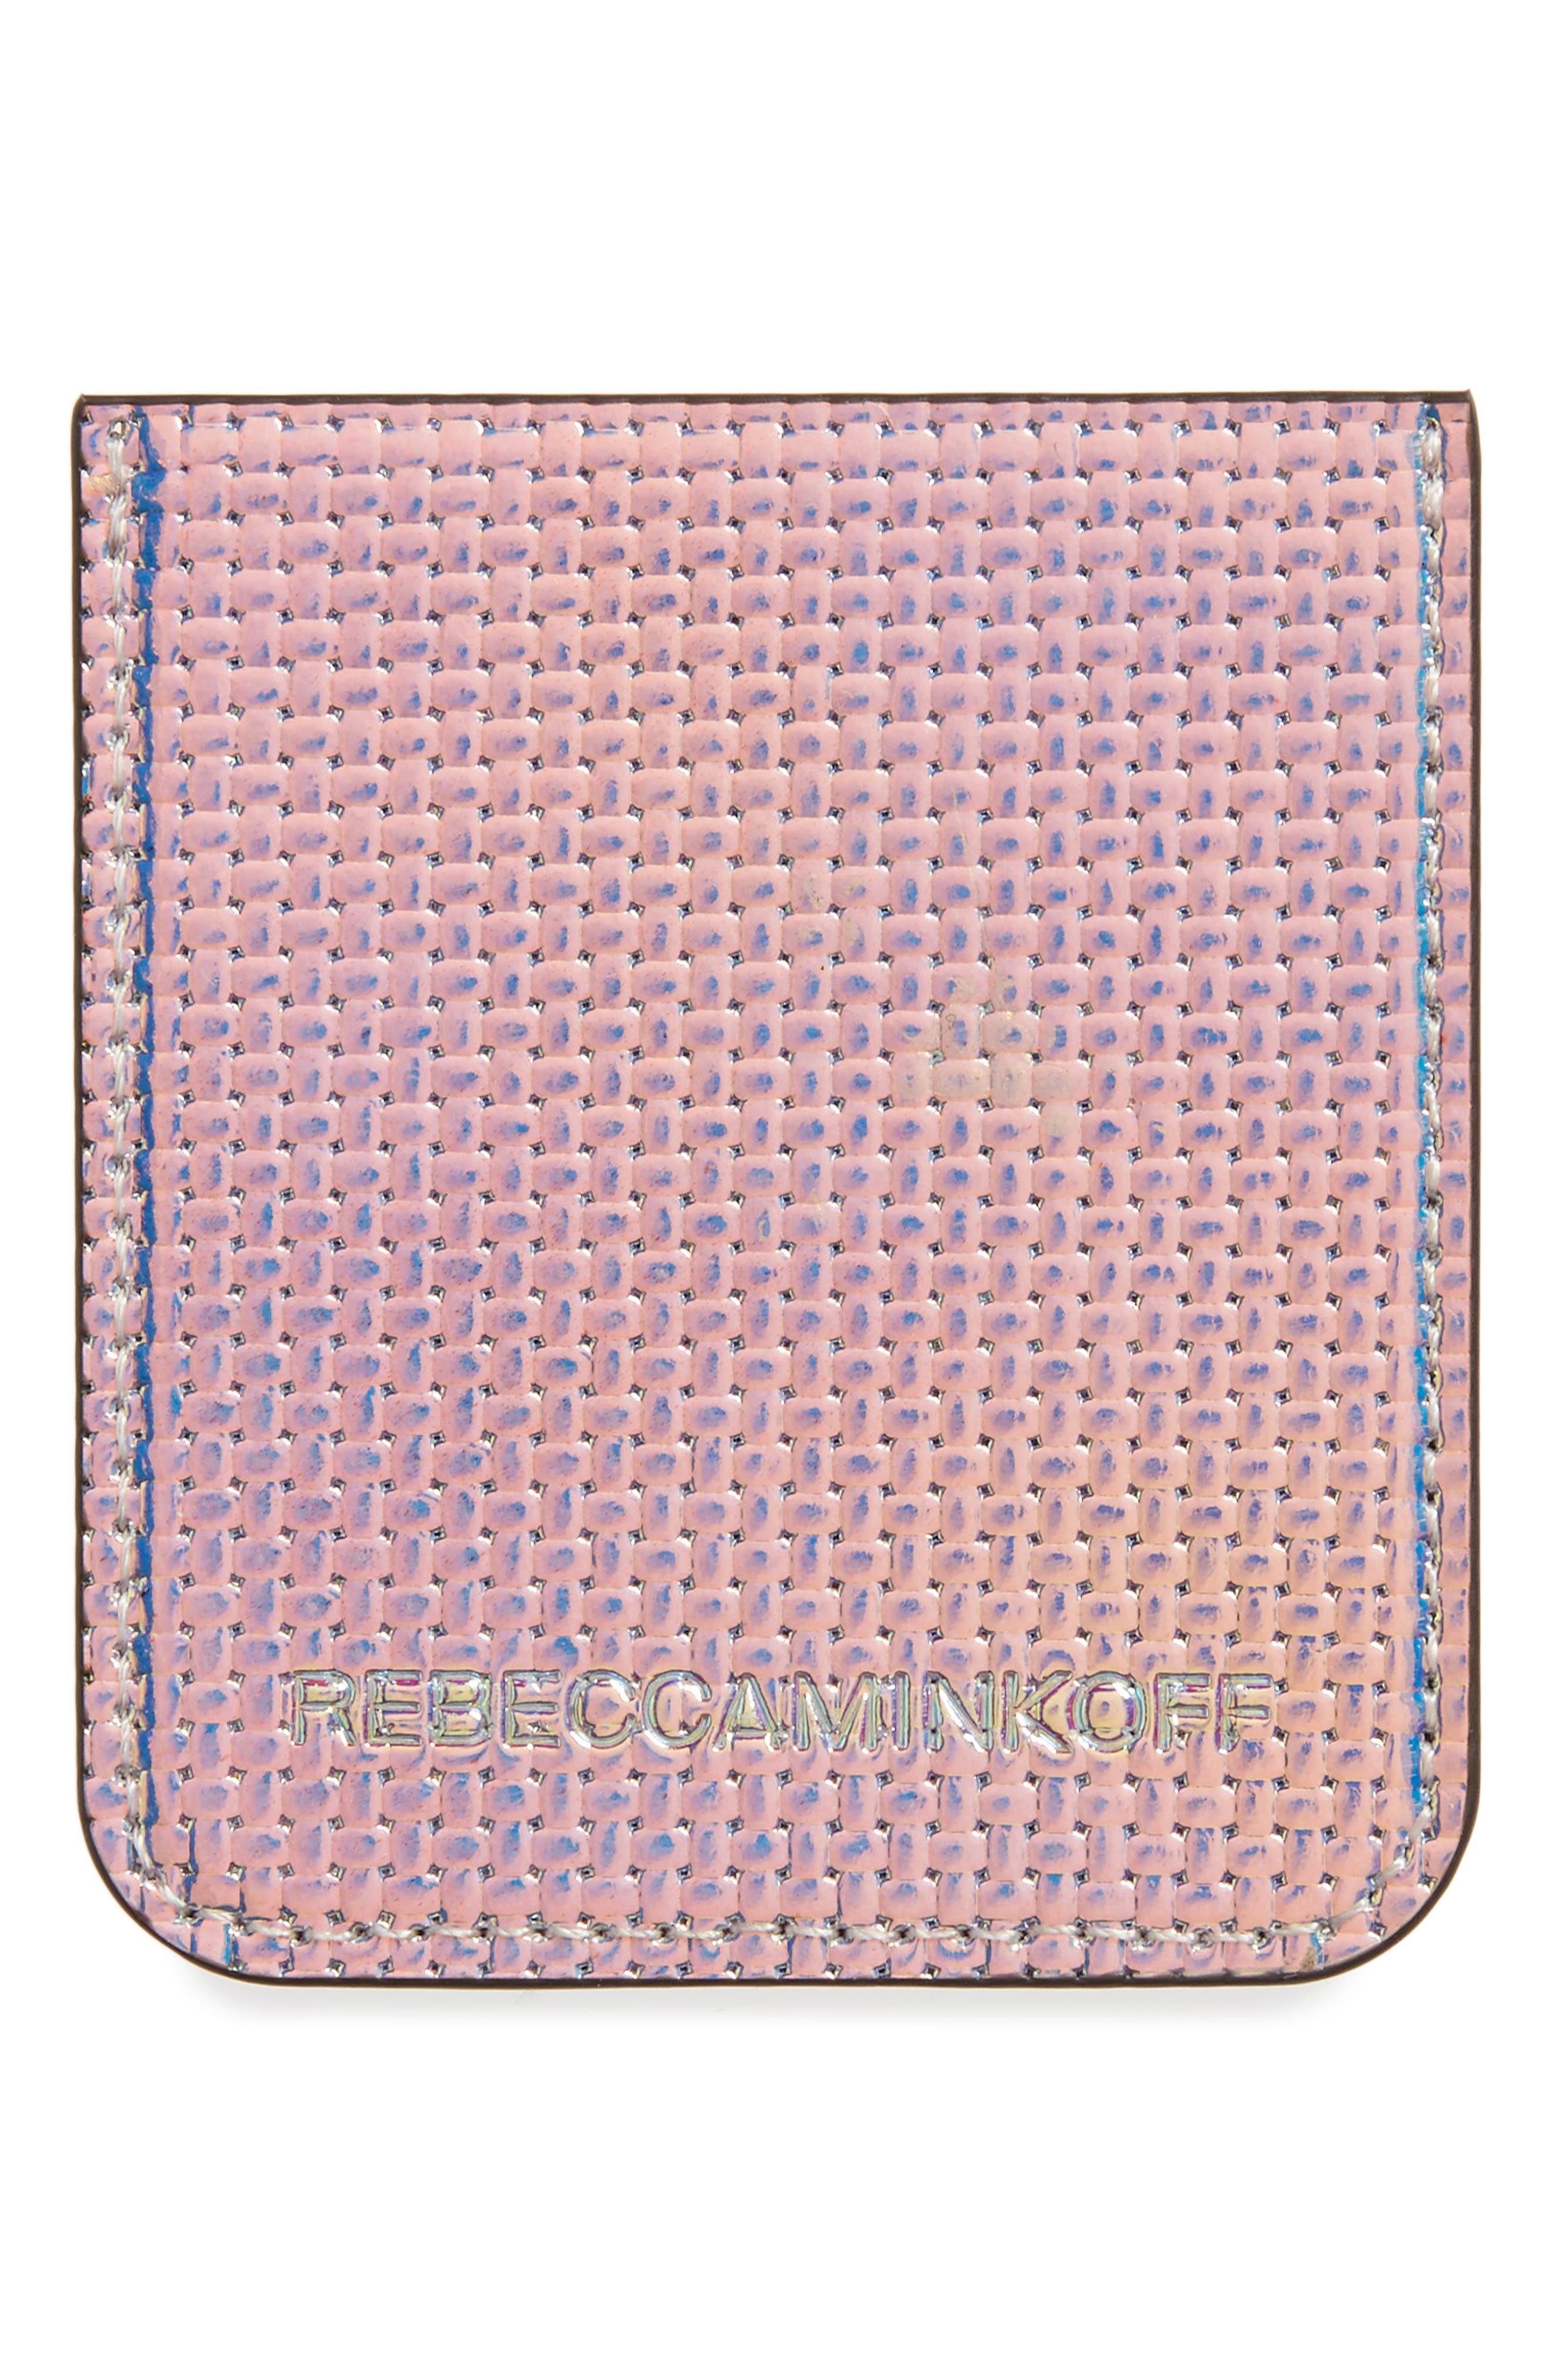 Adhesive Phone Sticker Pocket,                             Alternate thumbnail 2, color,                             300